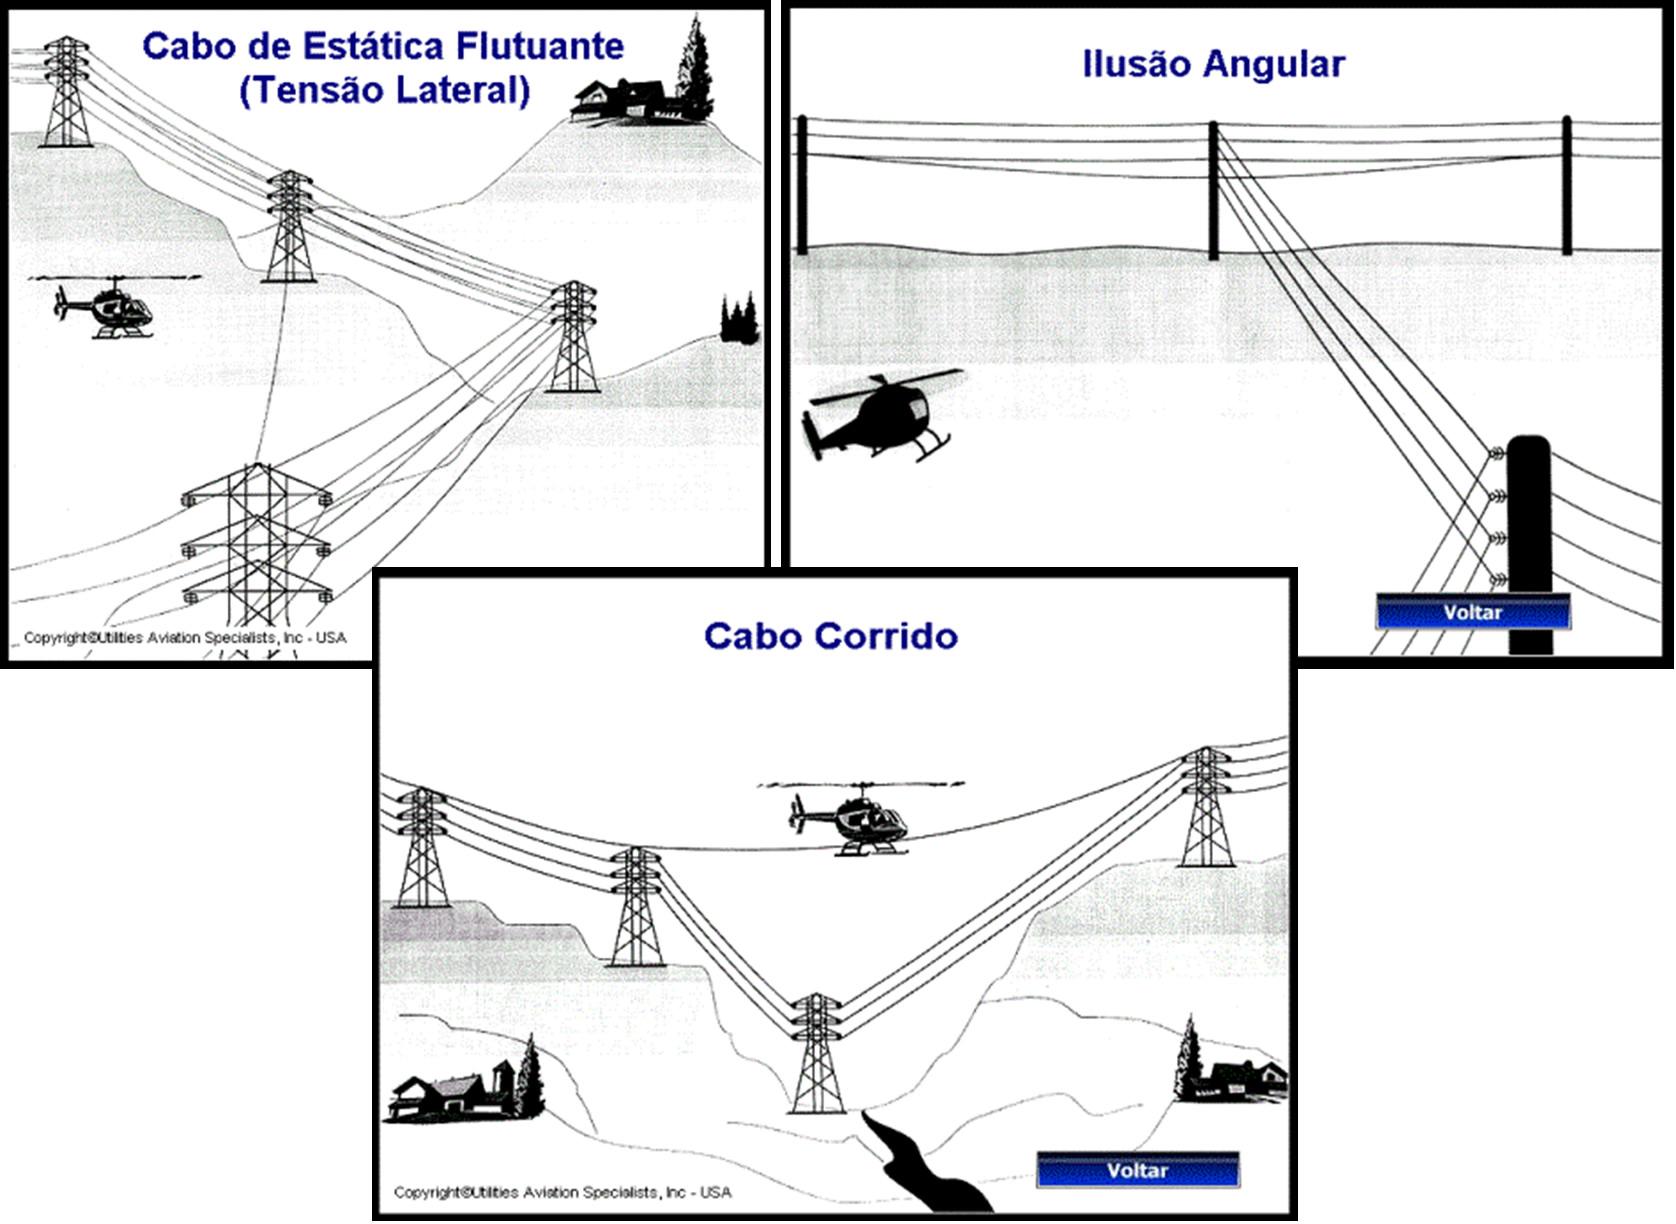 Imagens: Utilities Aviation Specialists, INC - USA.